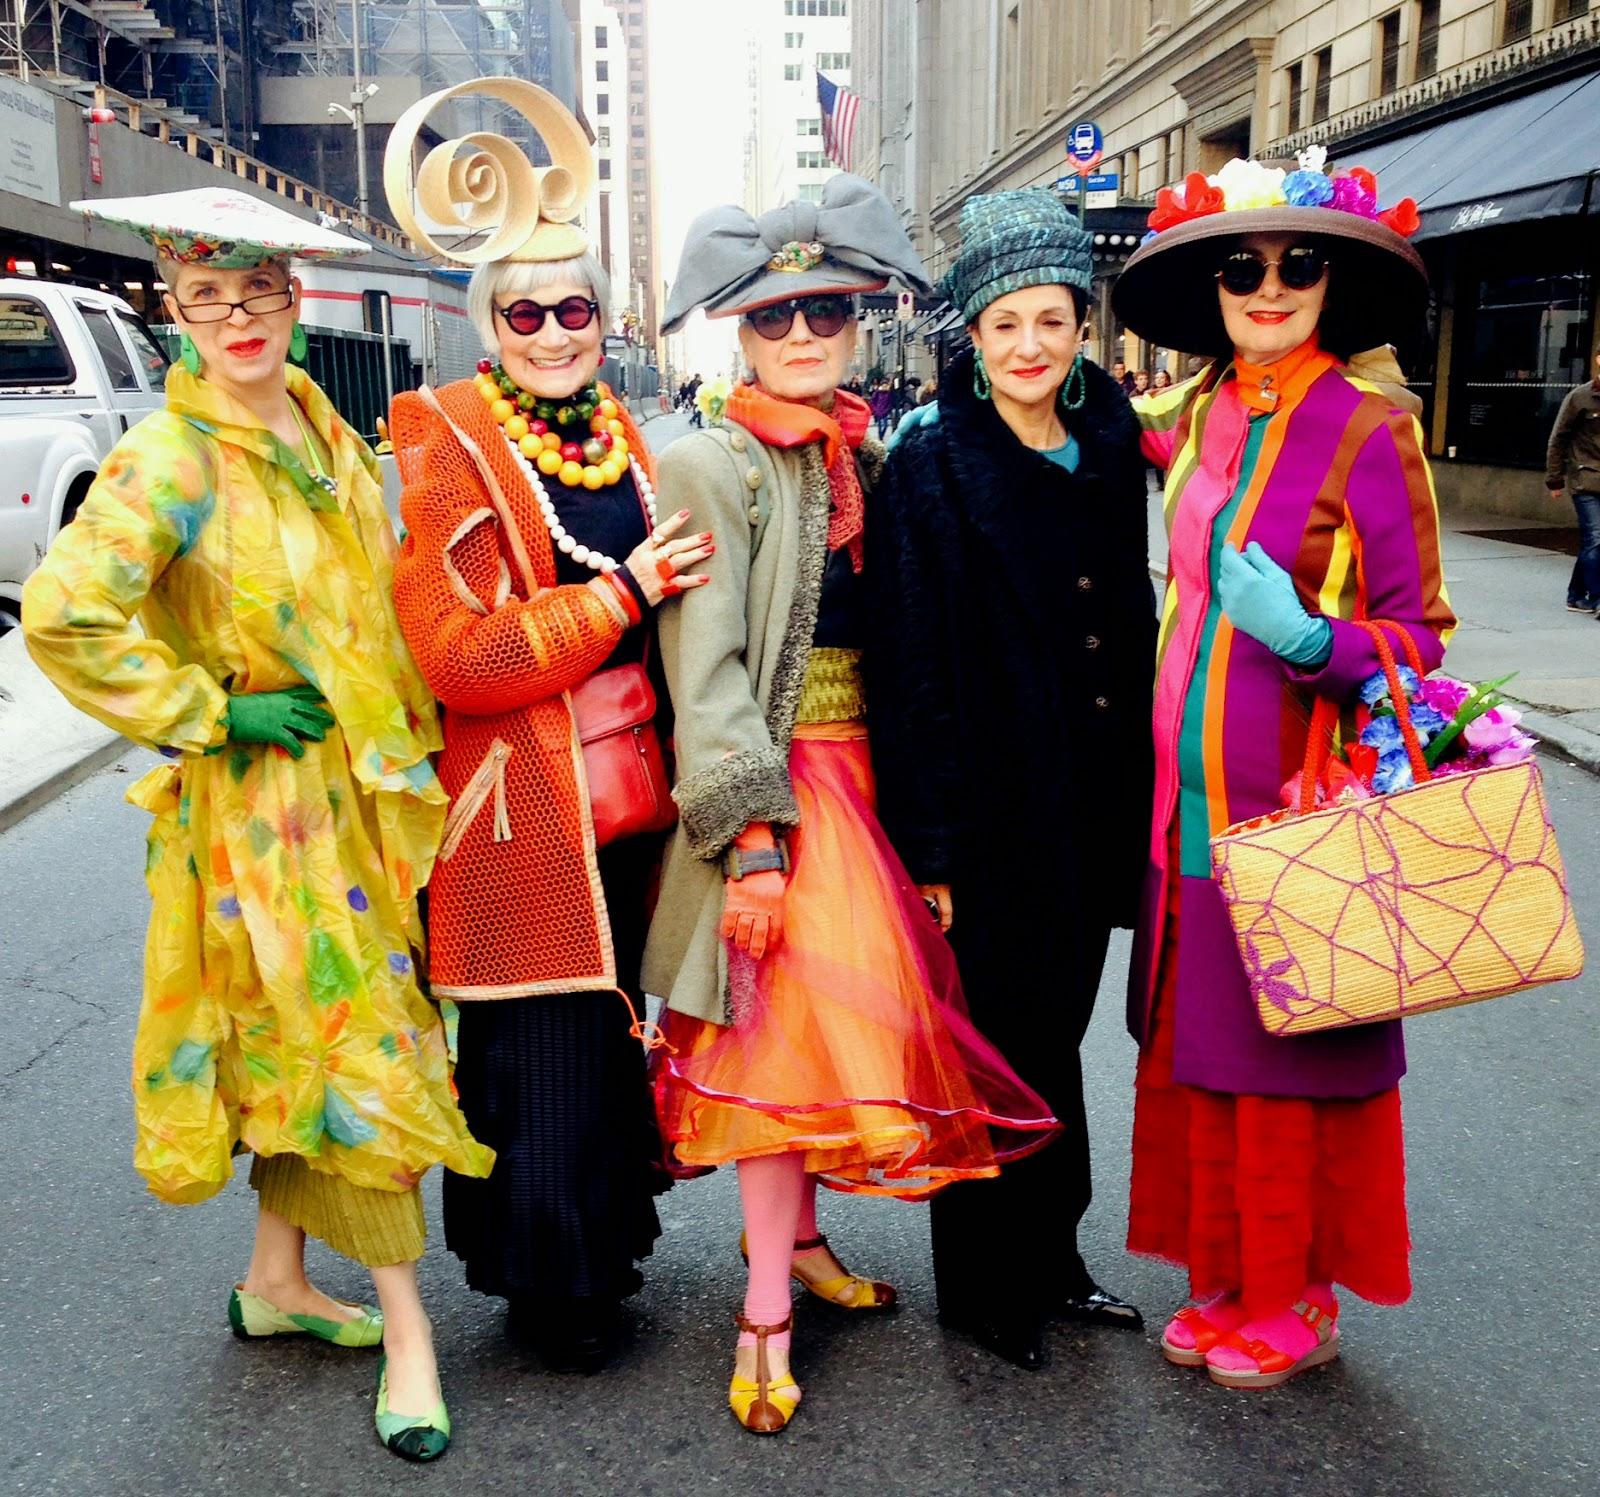 Valerie Idiosyncratic Instagram Rapoport: Idiosyncratic Fashionistas: Easter Parade 2015